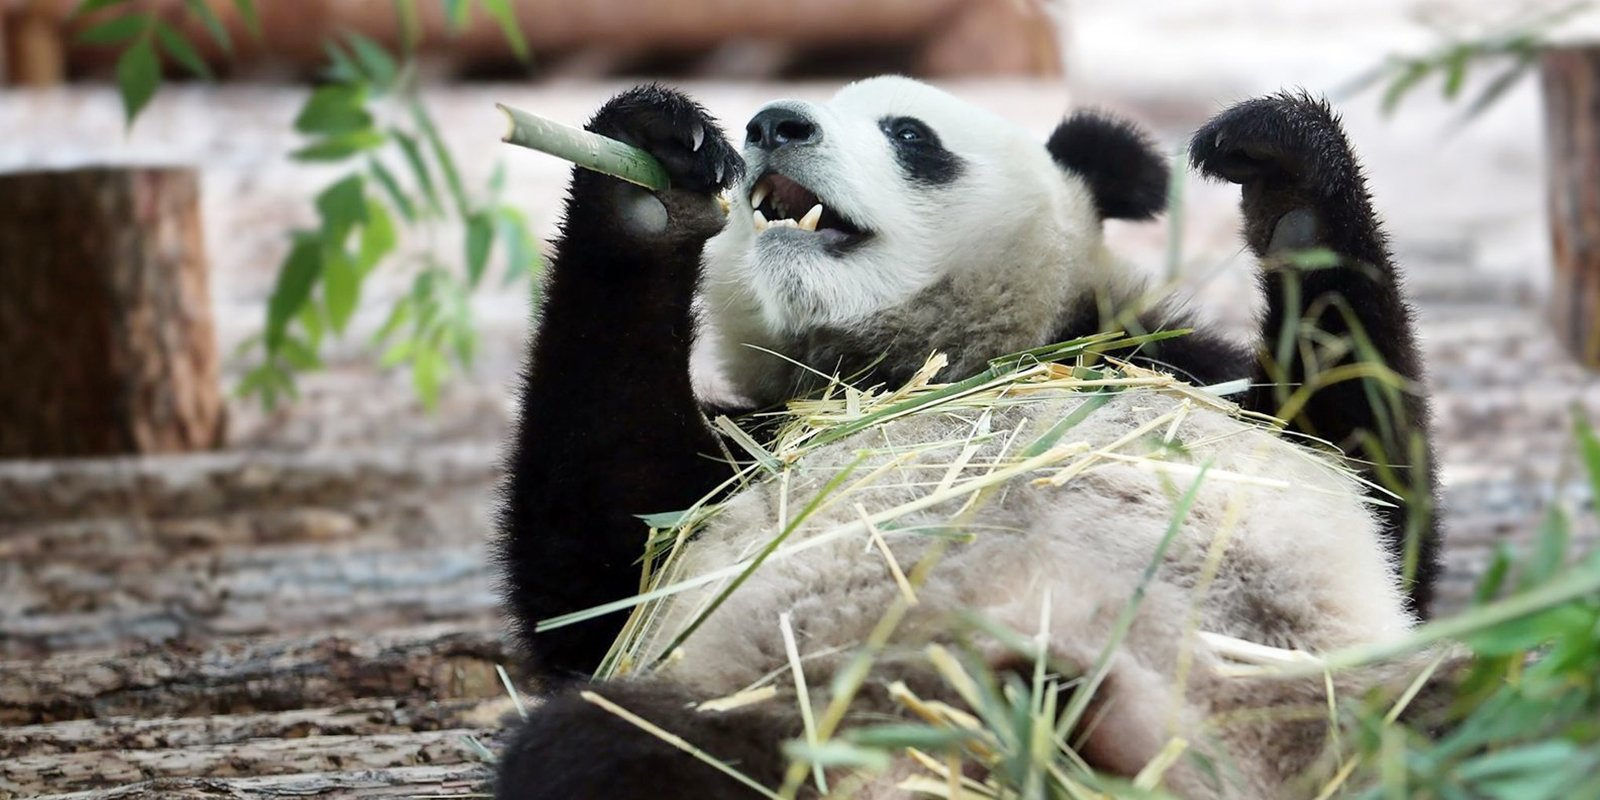 Фото: пресс-служба Московского зоопарка